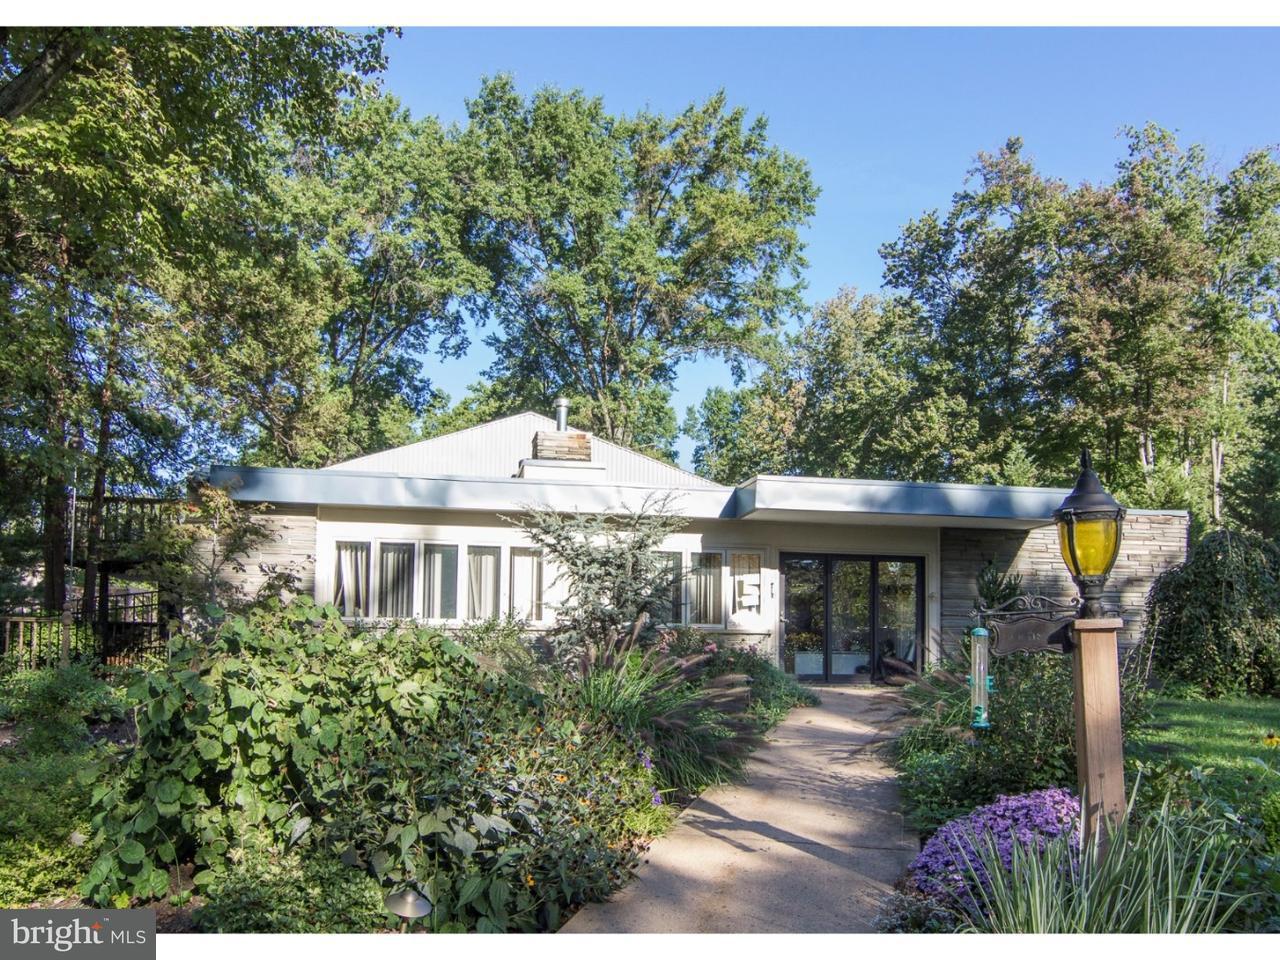 Single Family Home for Sale at 3934 DAVISVILLE Road Hatboro, Pennsylvania 19040 United States